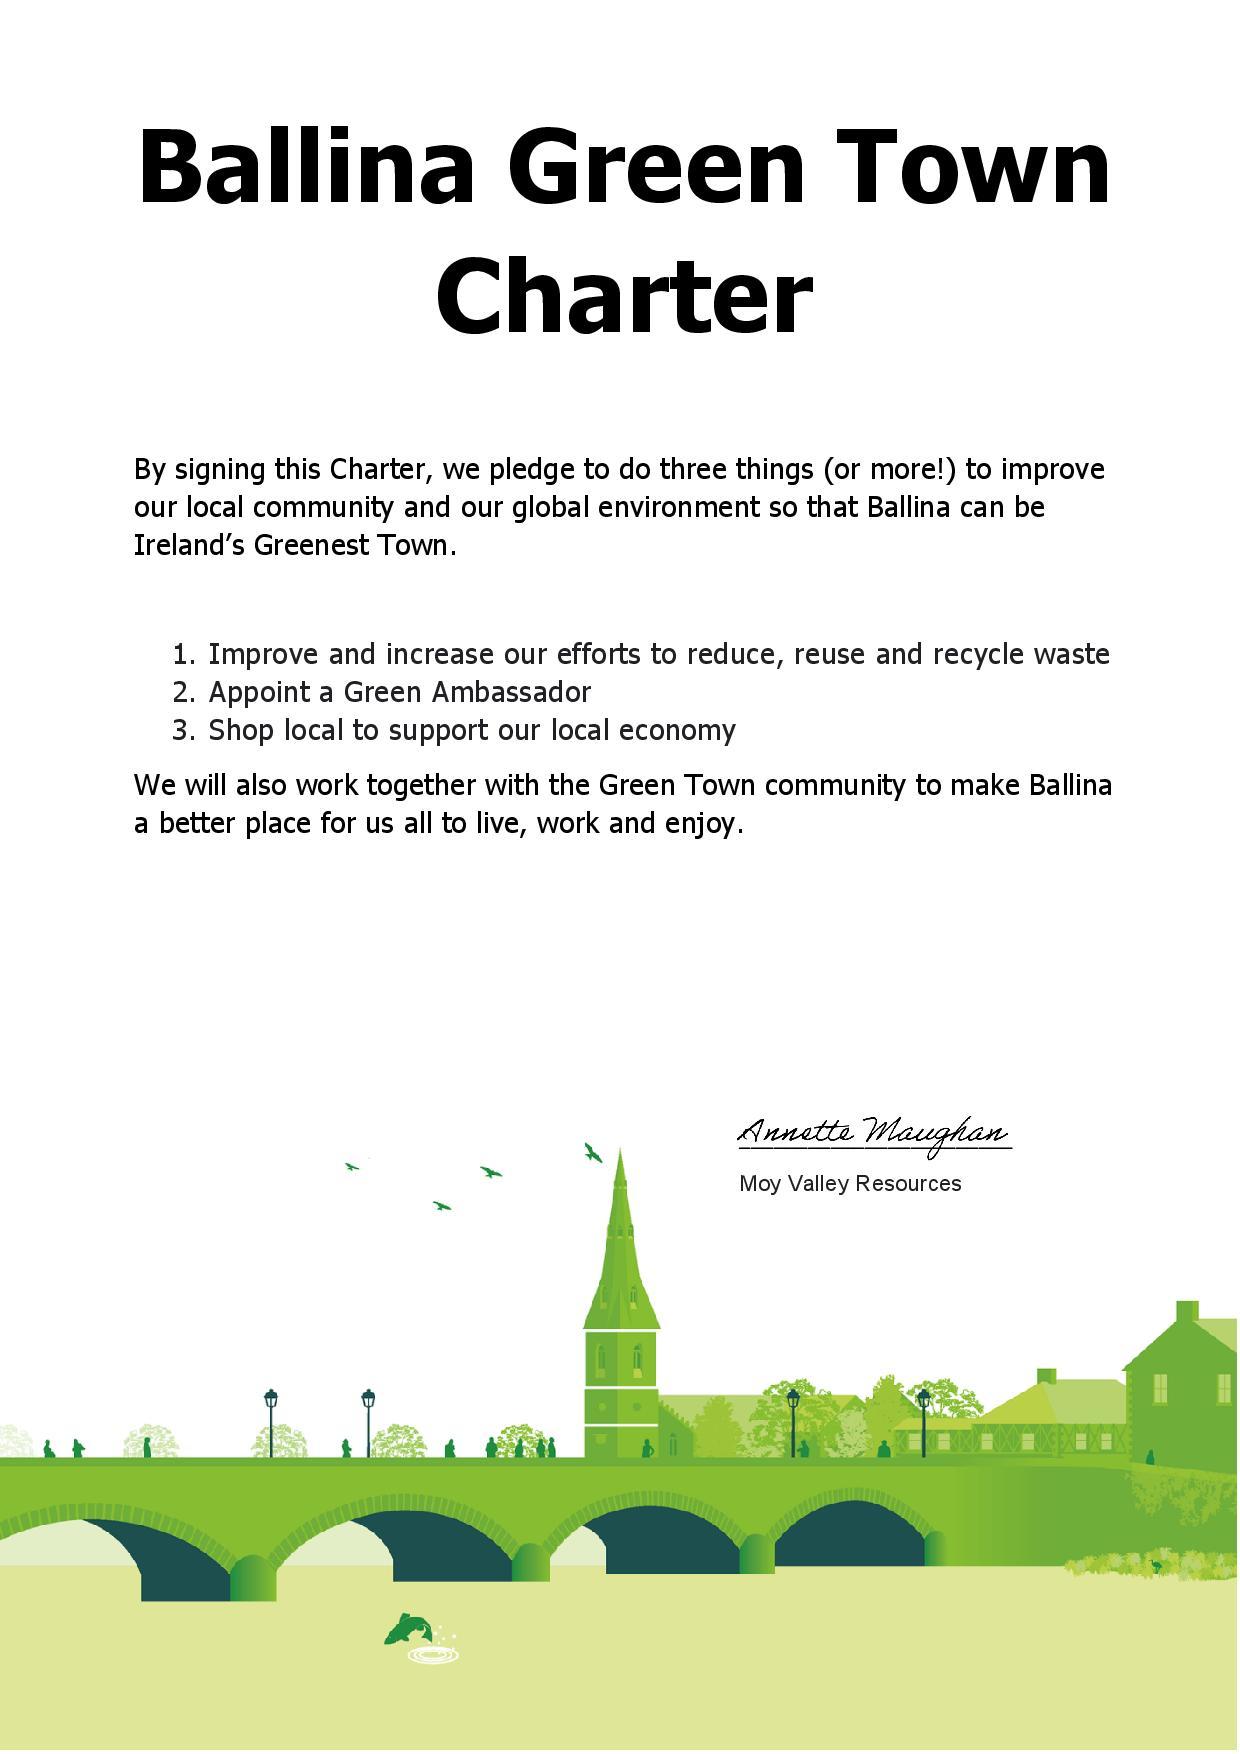 Ballina Green Town Charter Moy Valley Resources IRD Ireland's Greenest Town